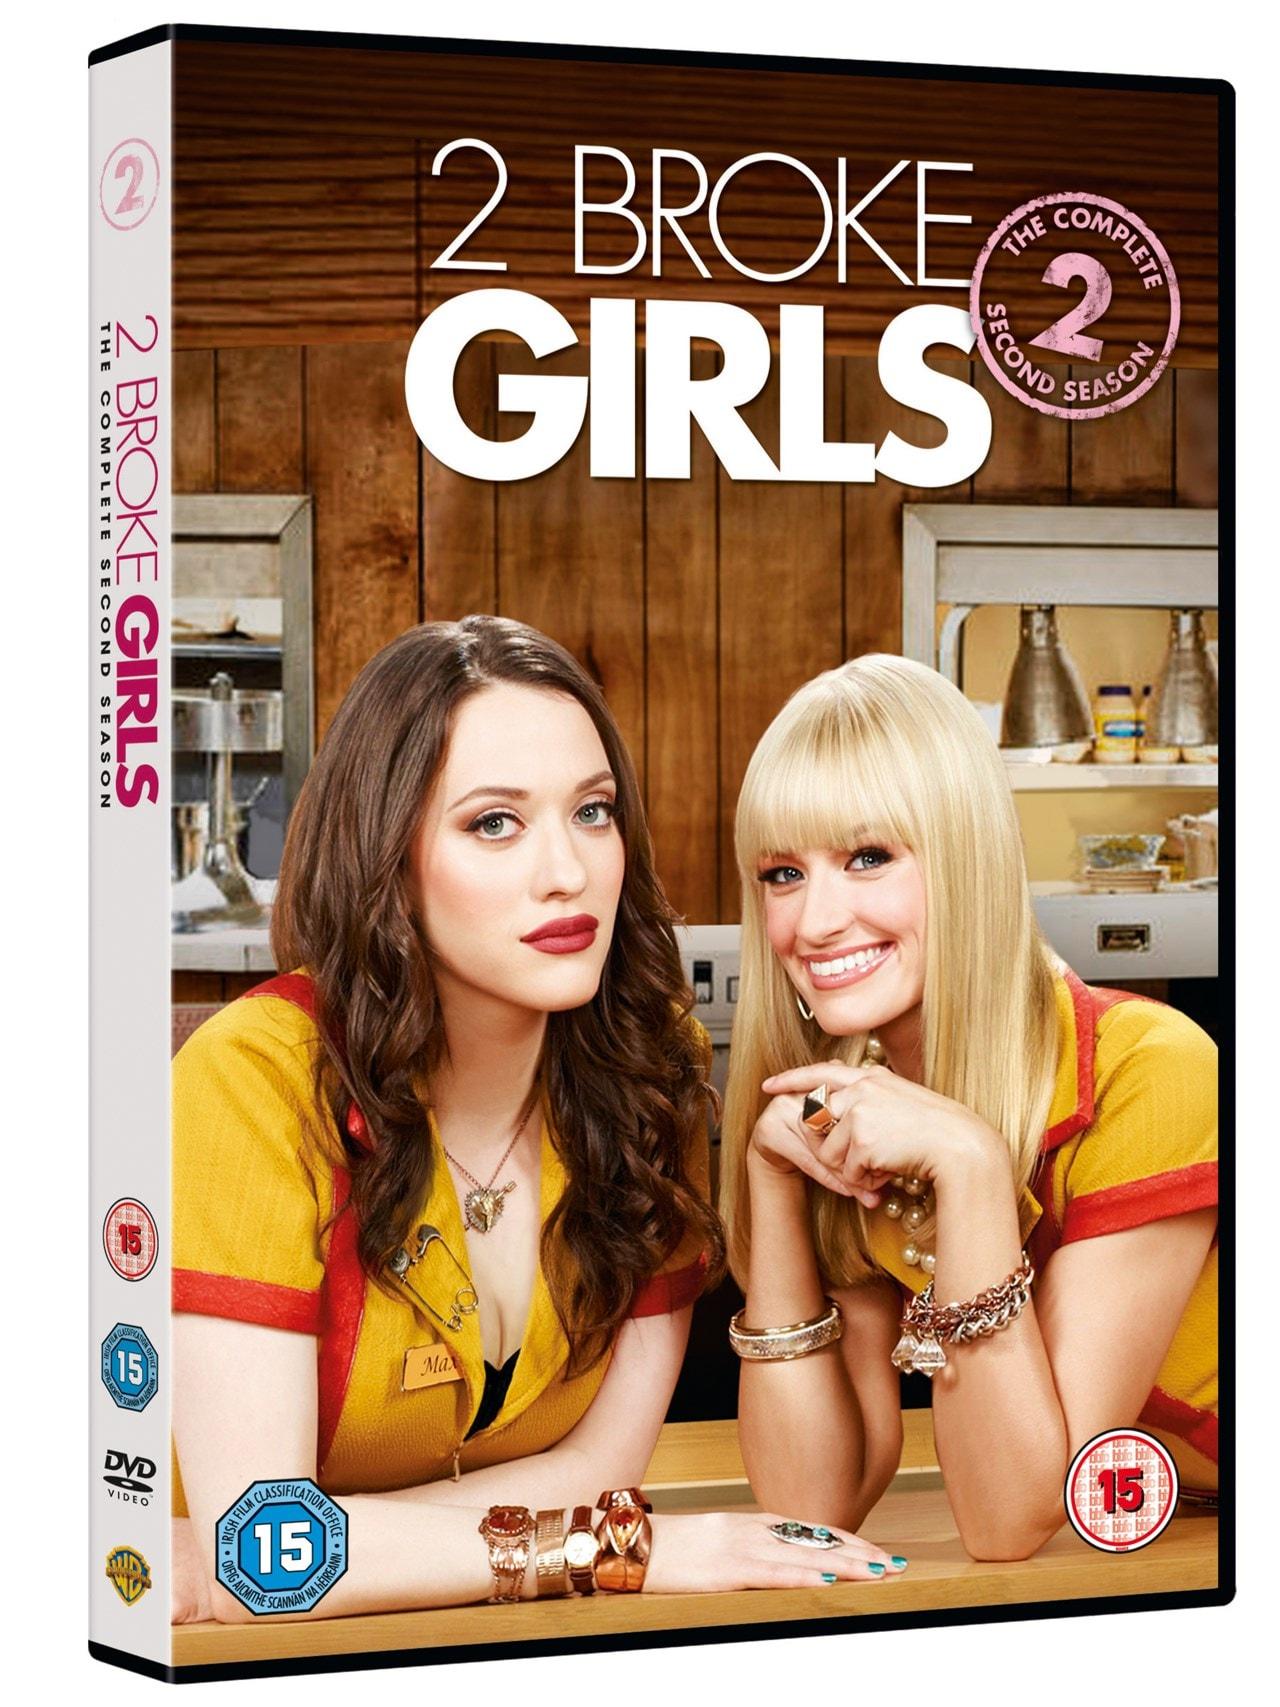 2 Broke Girls: The Complete Second Season - 2